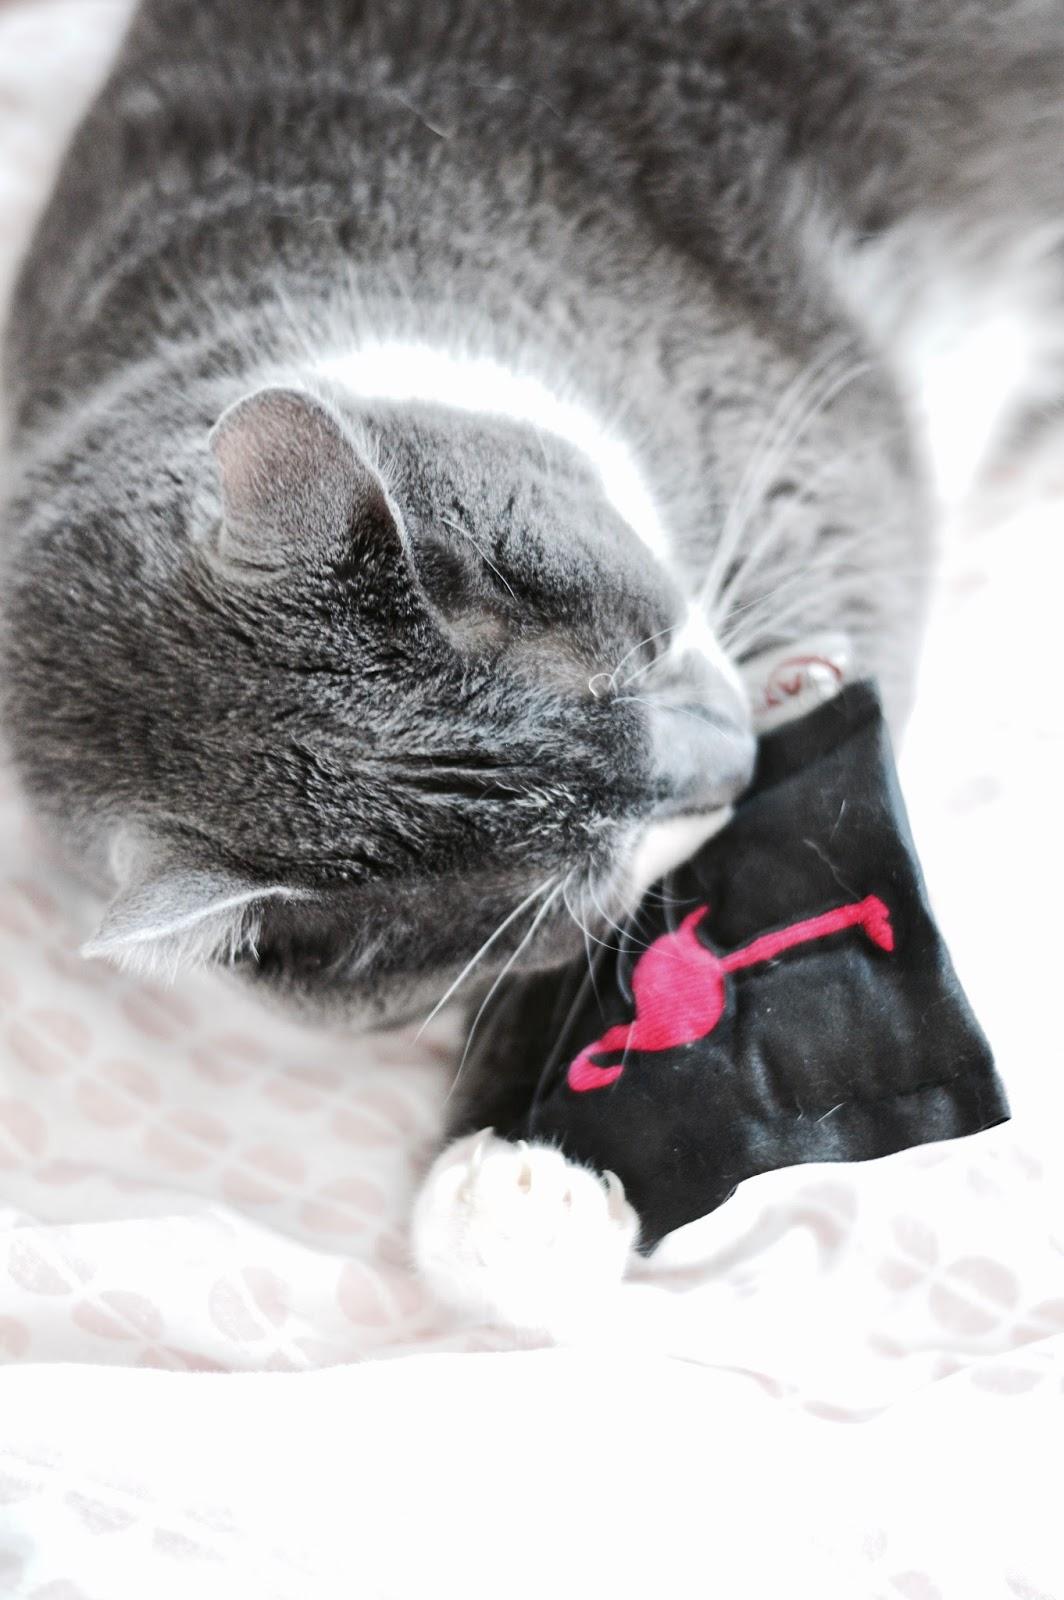 miaoubox, la box qui rend les chats heureux